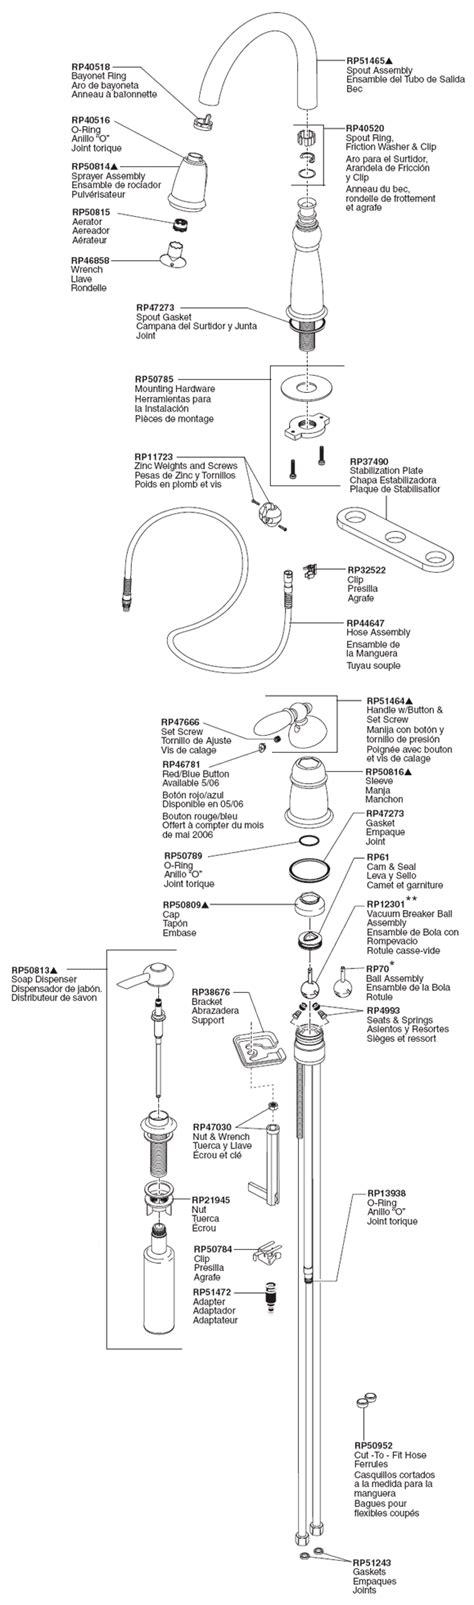 delta faucet 2274 lhp h24 a24 parts list and diagram delta kitchen faucet parts diagram 28 images delta